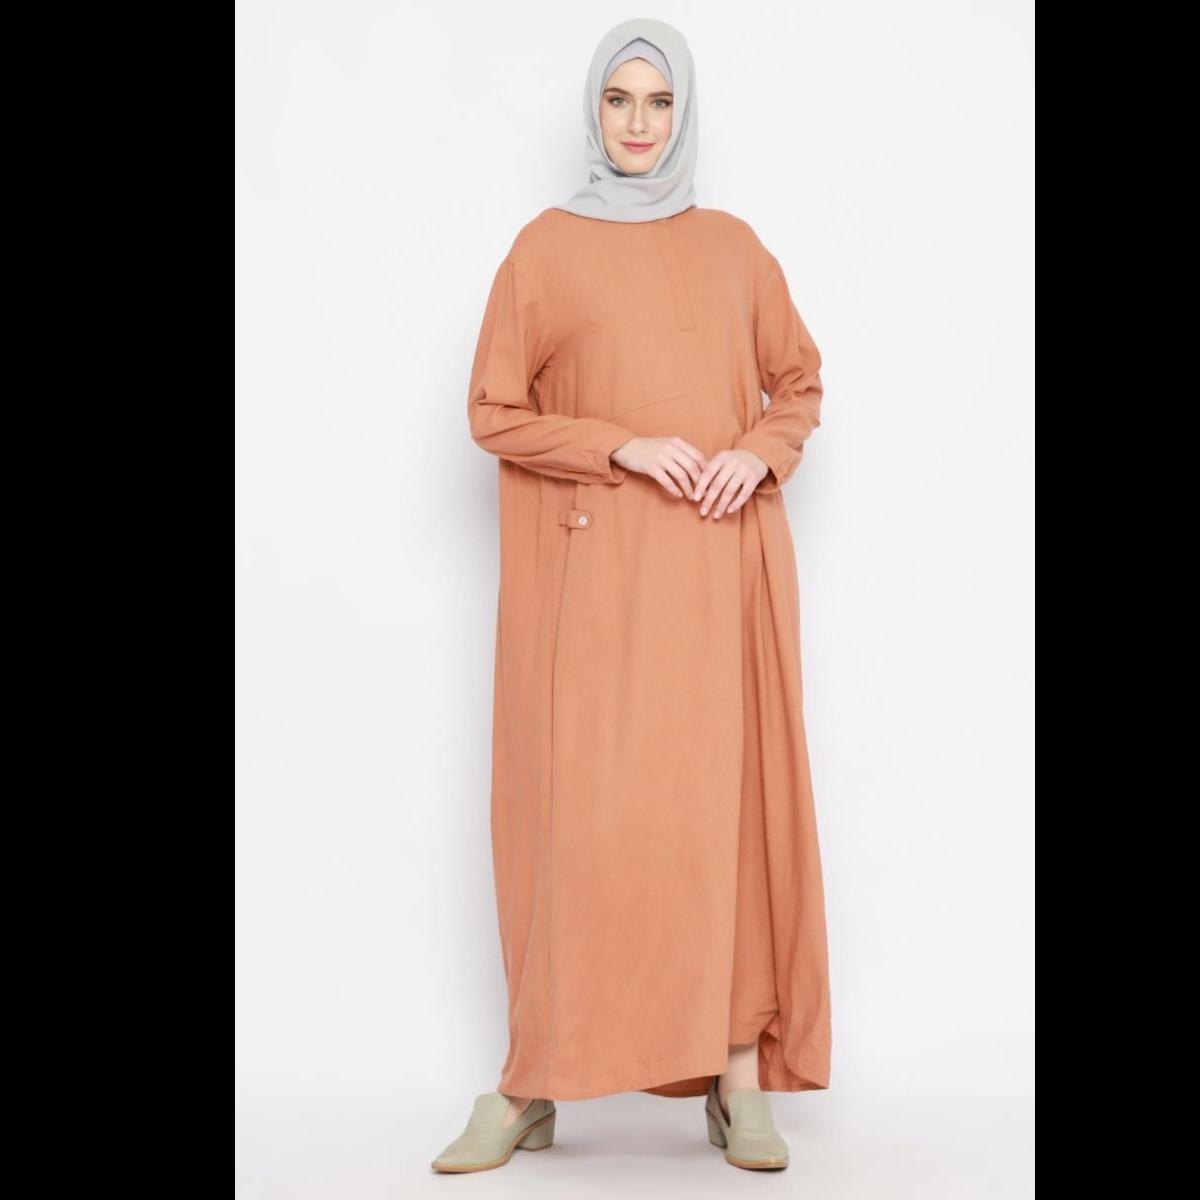 Grellet Dress Plain 0955 0621 L/XL